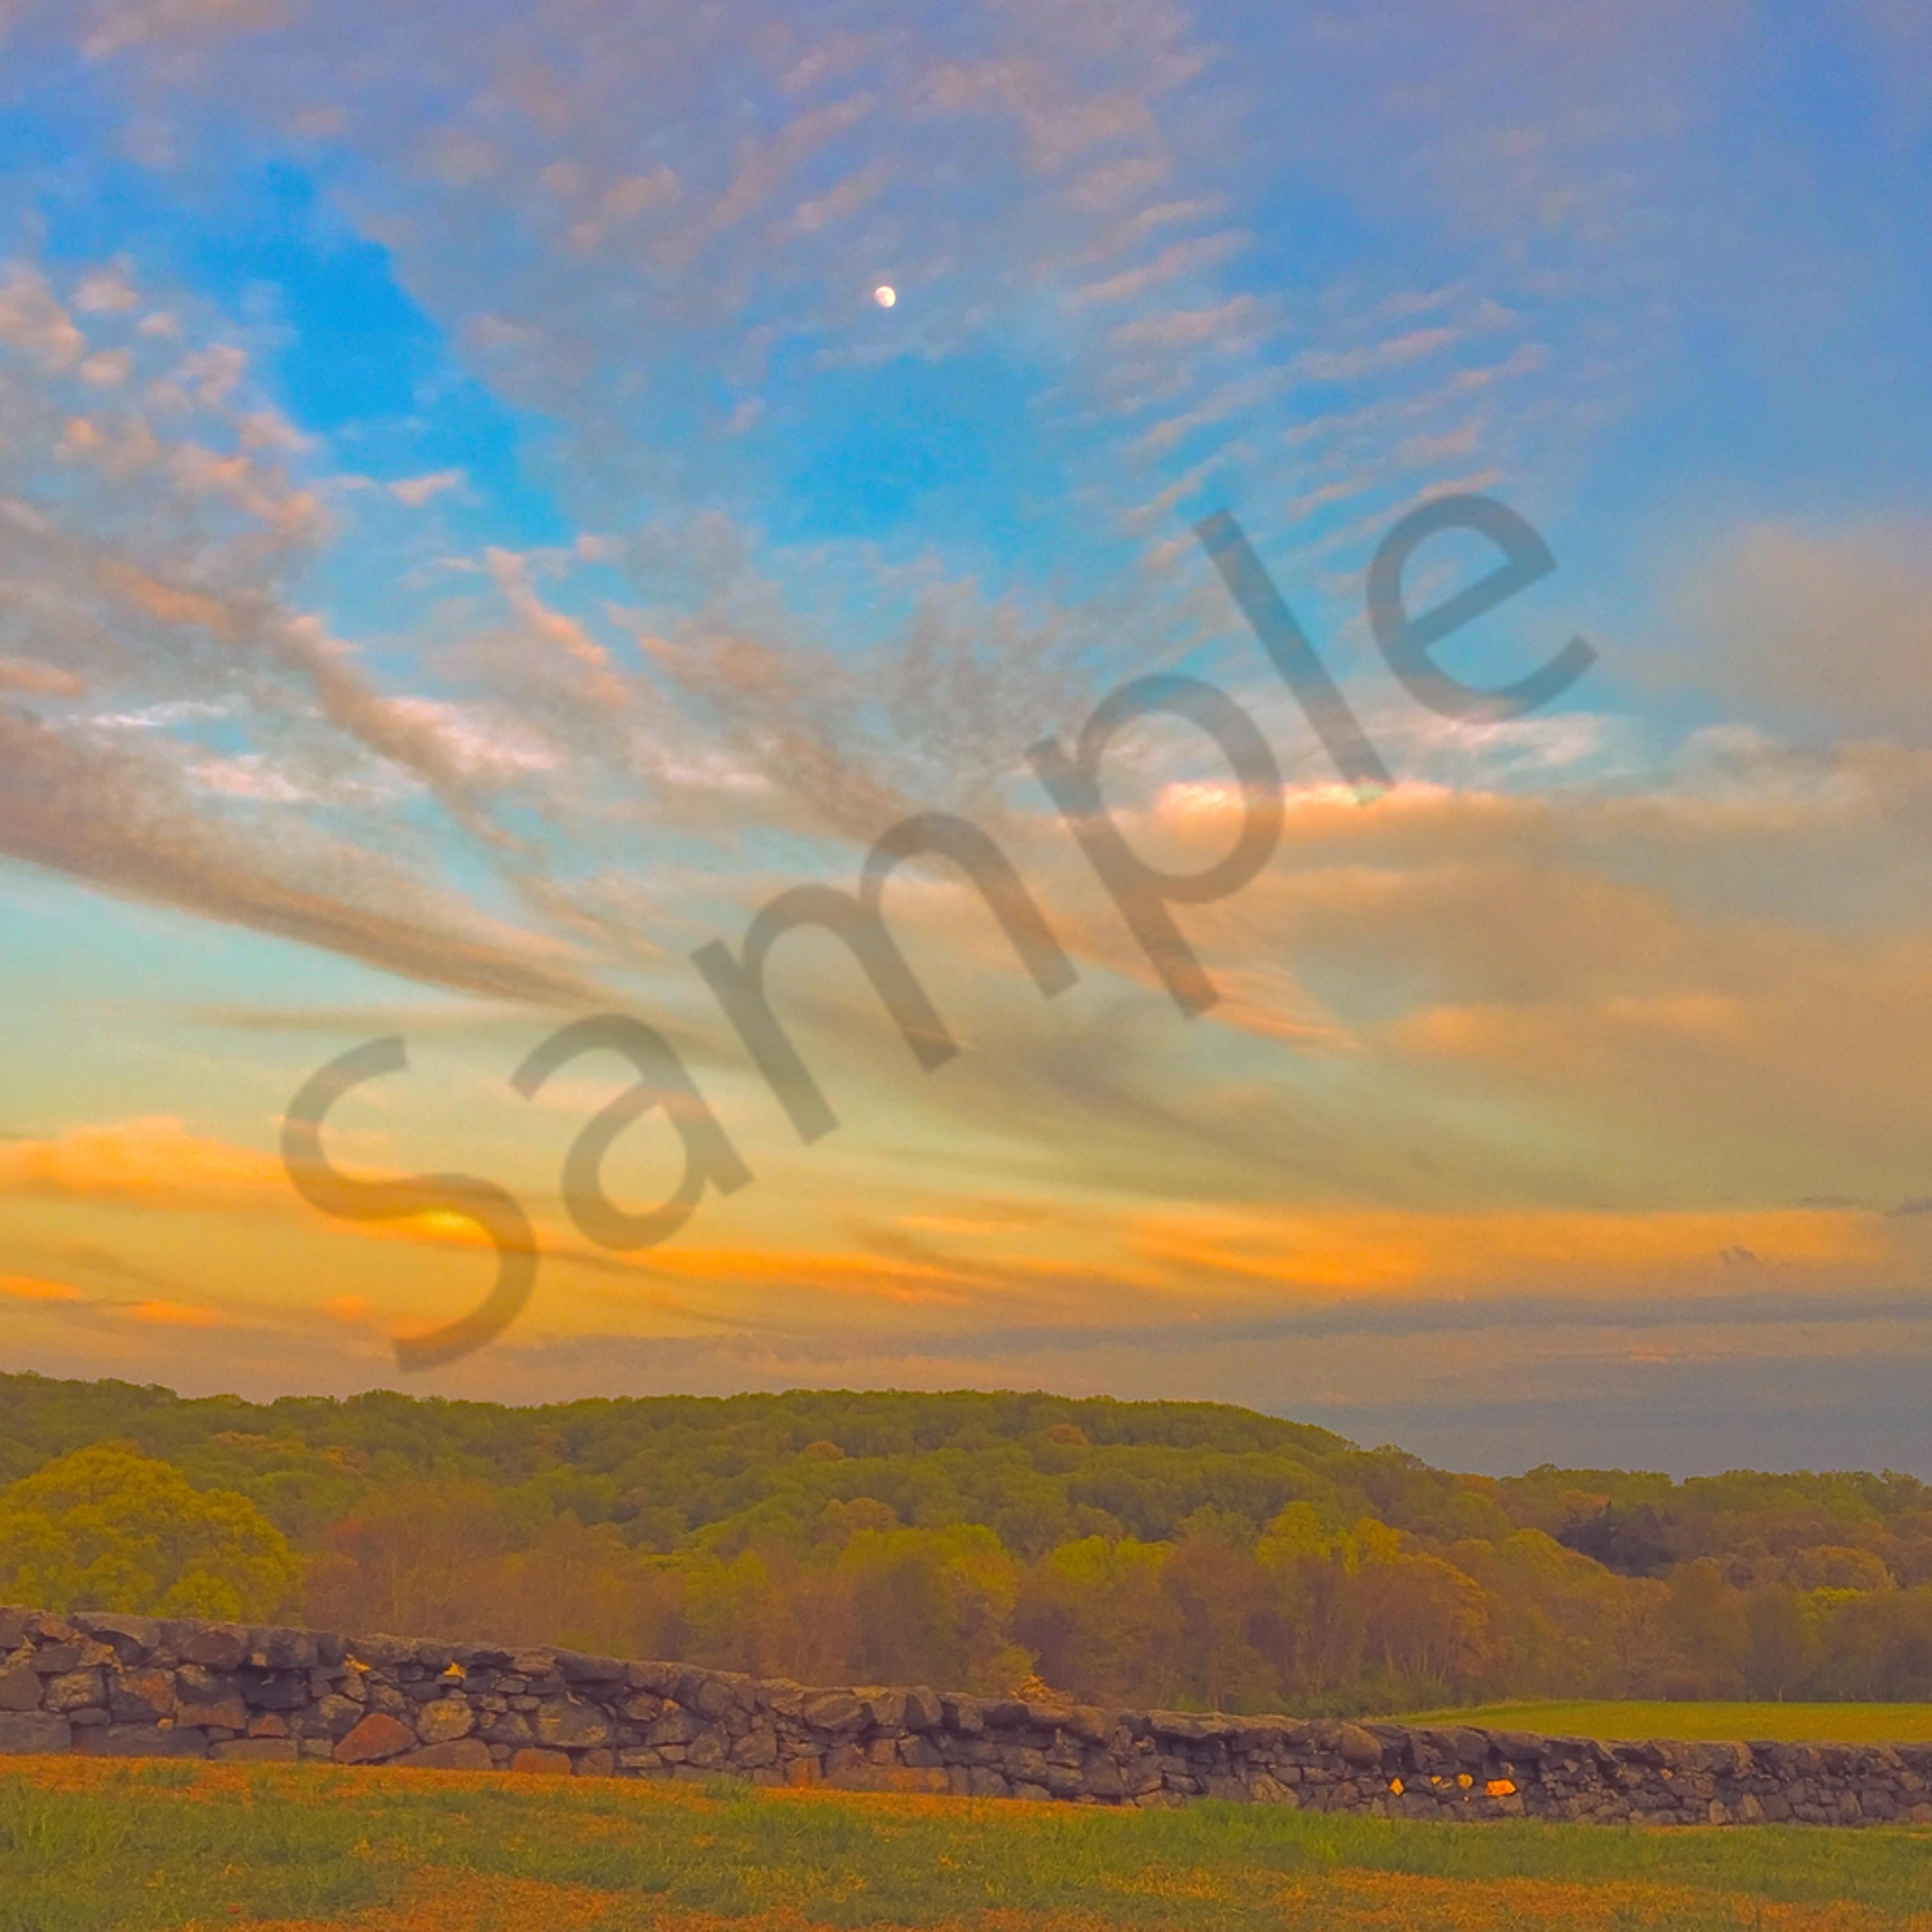 Brandywine spring sky website fkmf3k